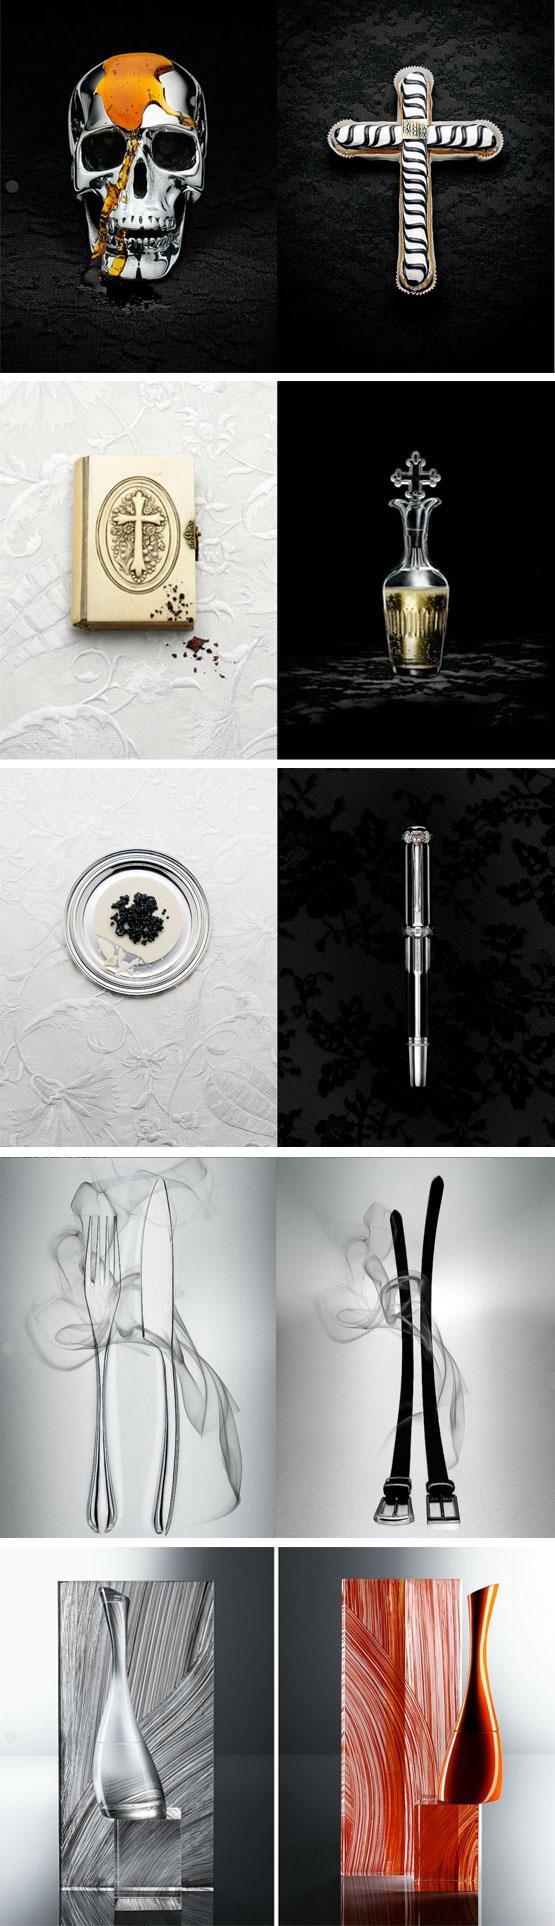 Adolfo Fiori | MRG LAB BLOG creative experience